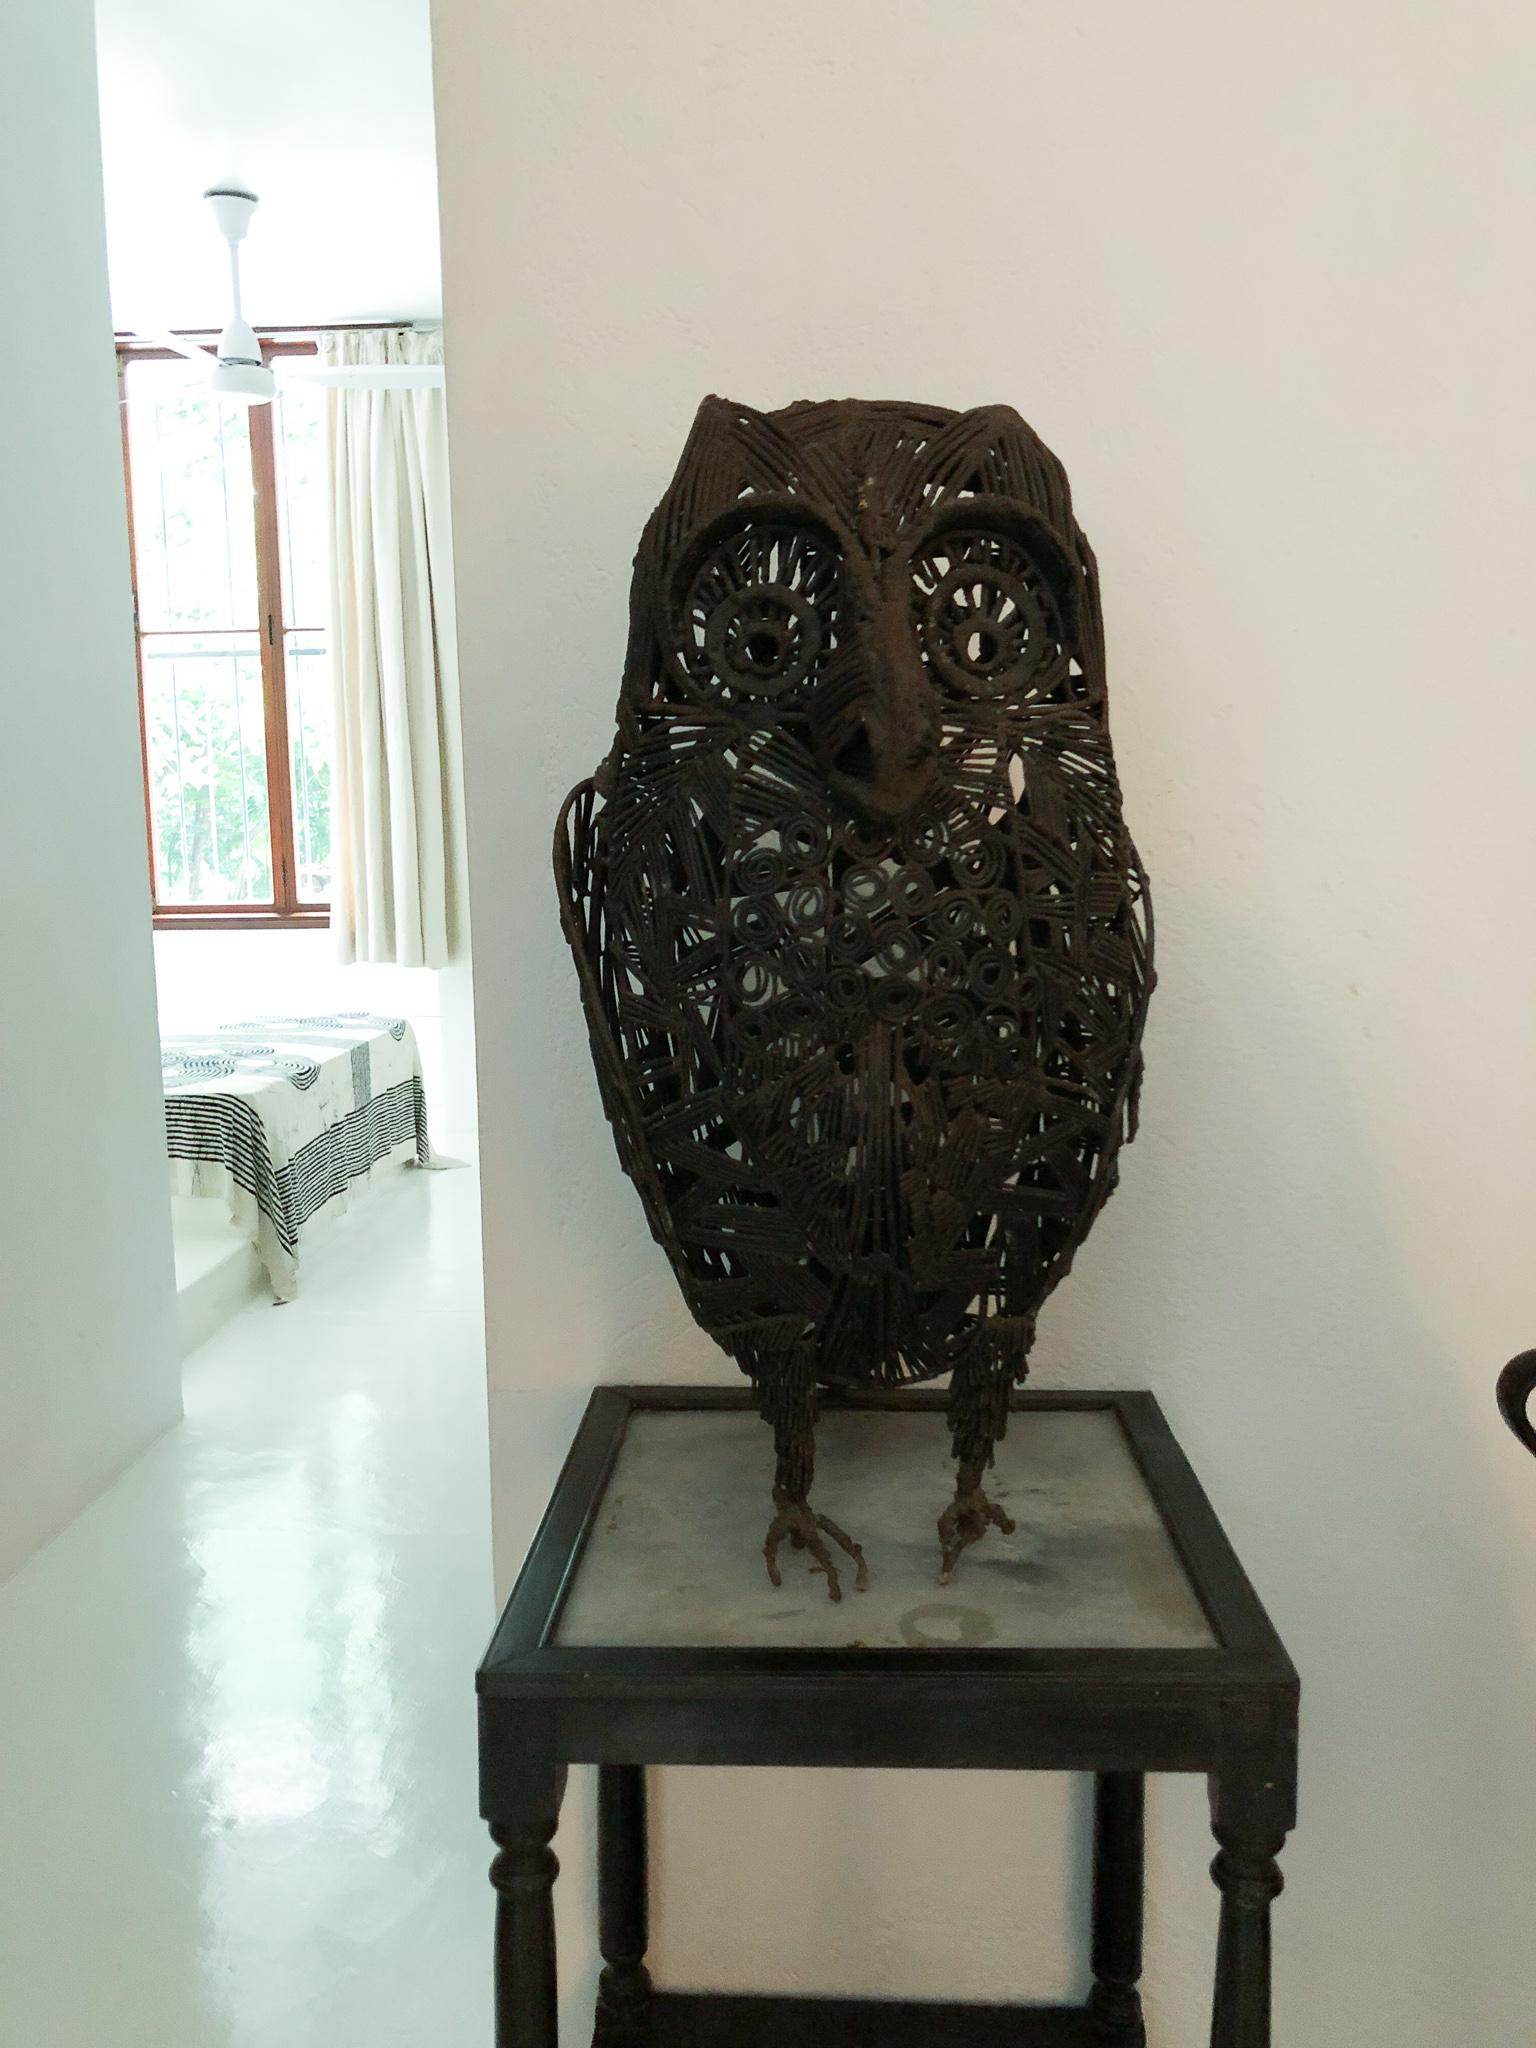 Bawa house: Laki Senanayake sculpture